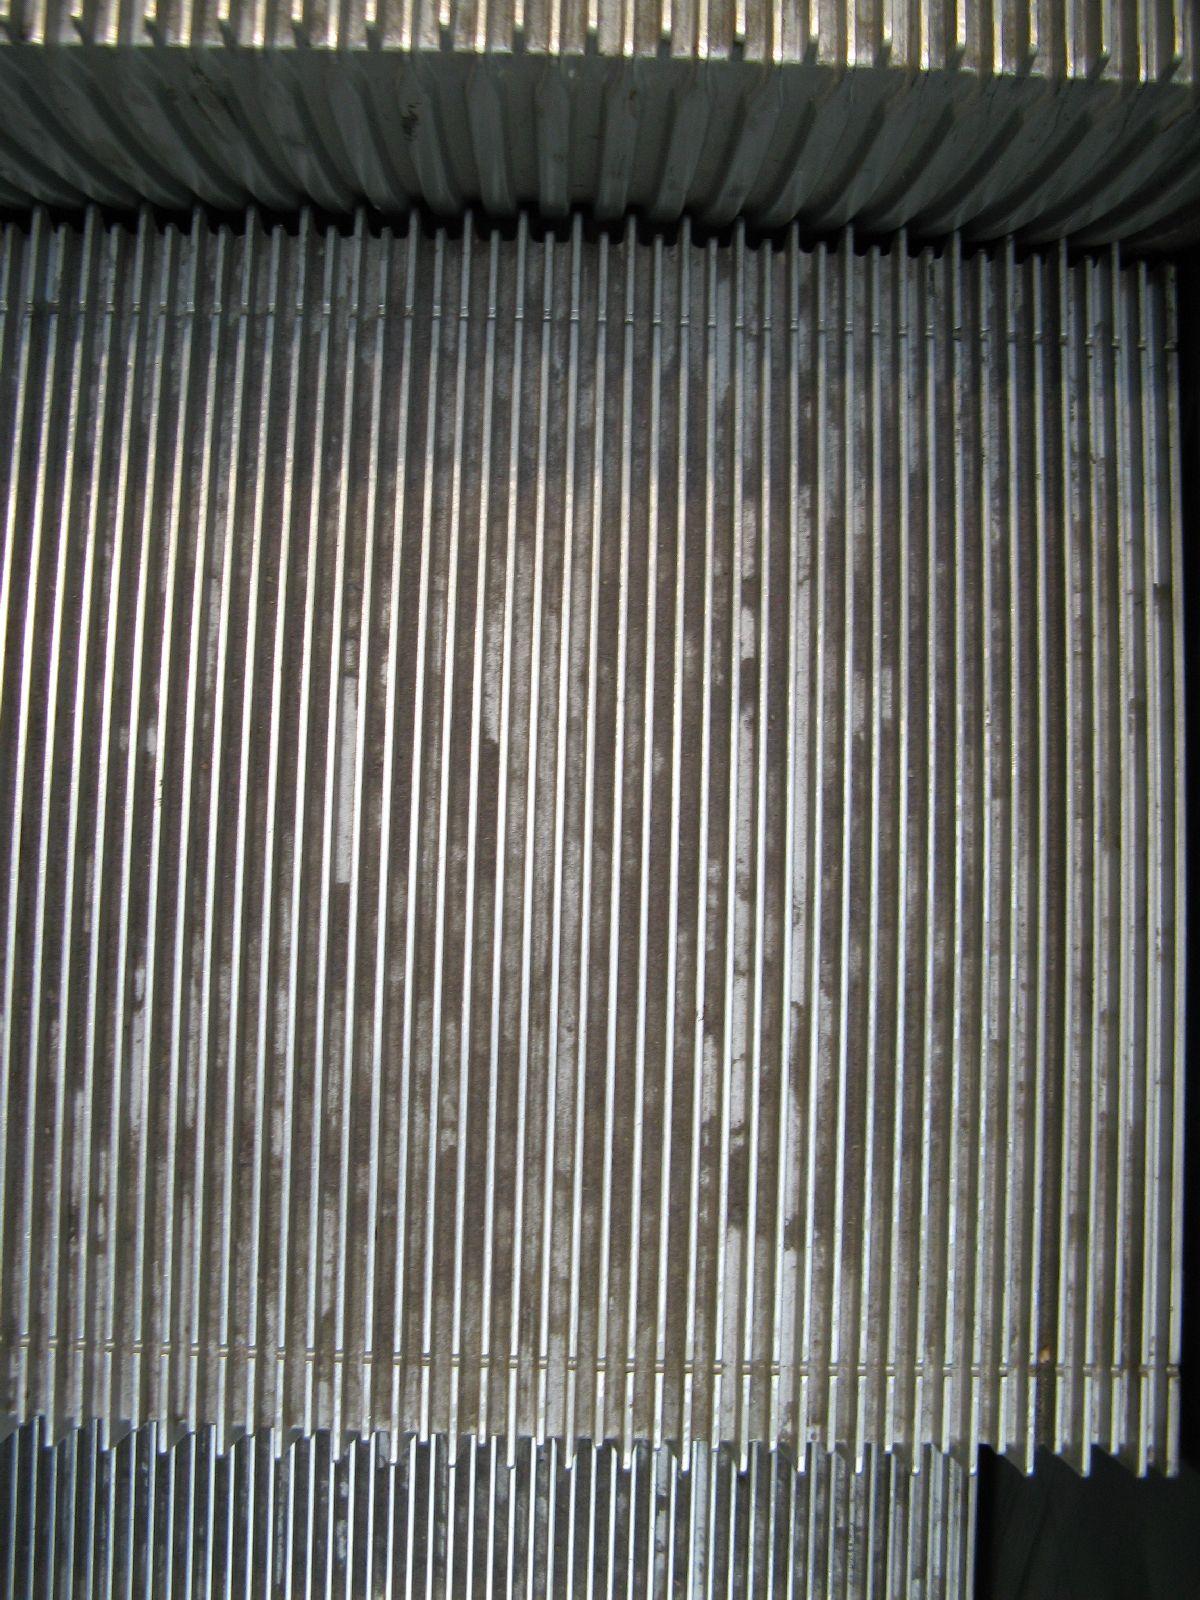 Metall_Textur_B_0765